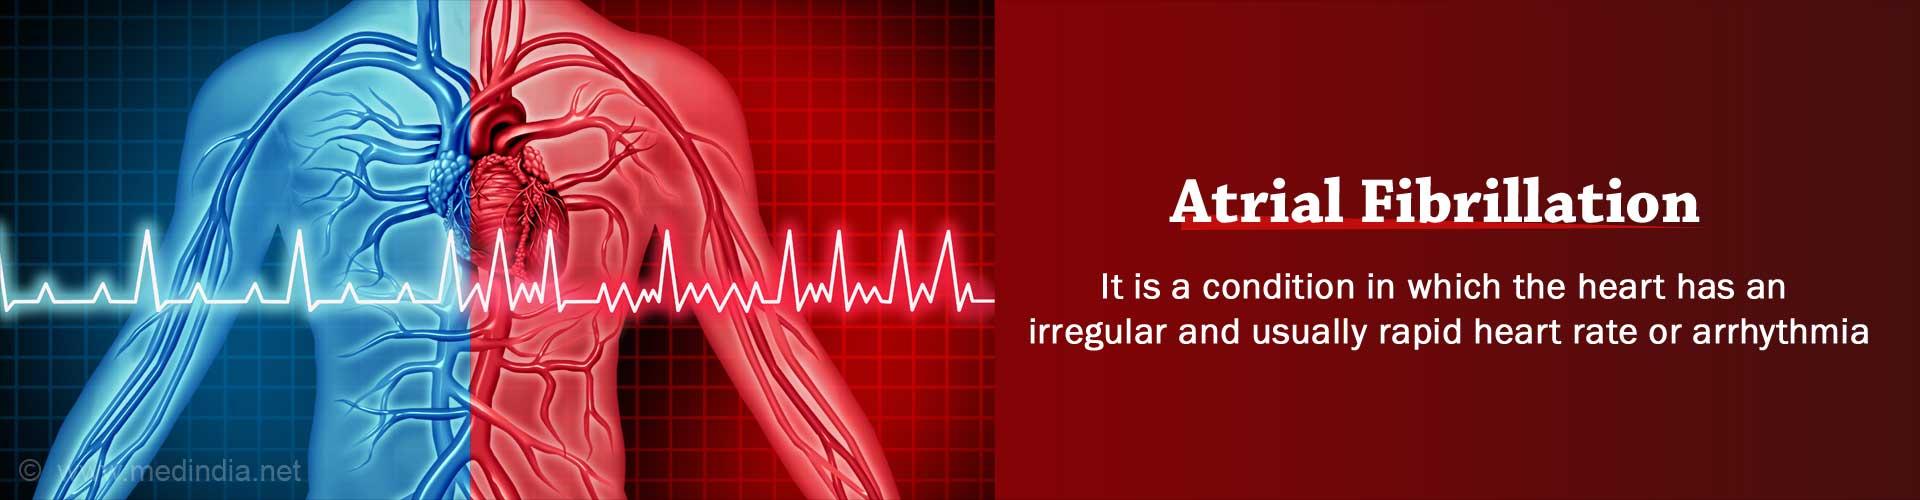 Atrial Fibrillation - Causes, Symptoms, Diagnosis, Treatment, Complication, Risks